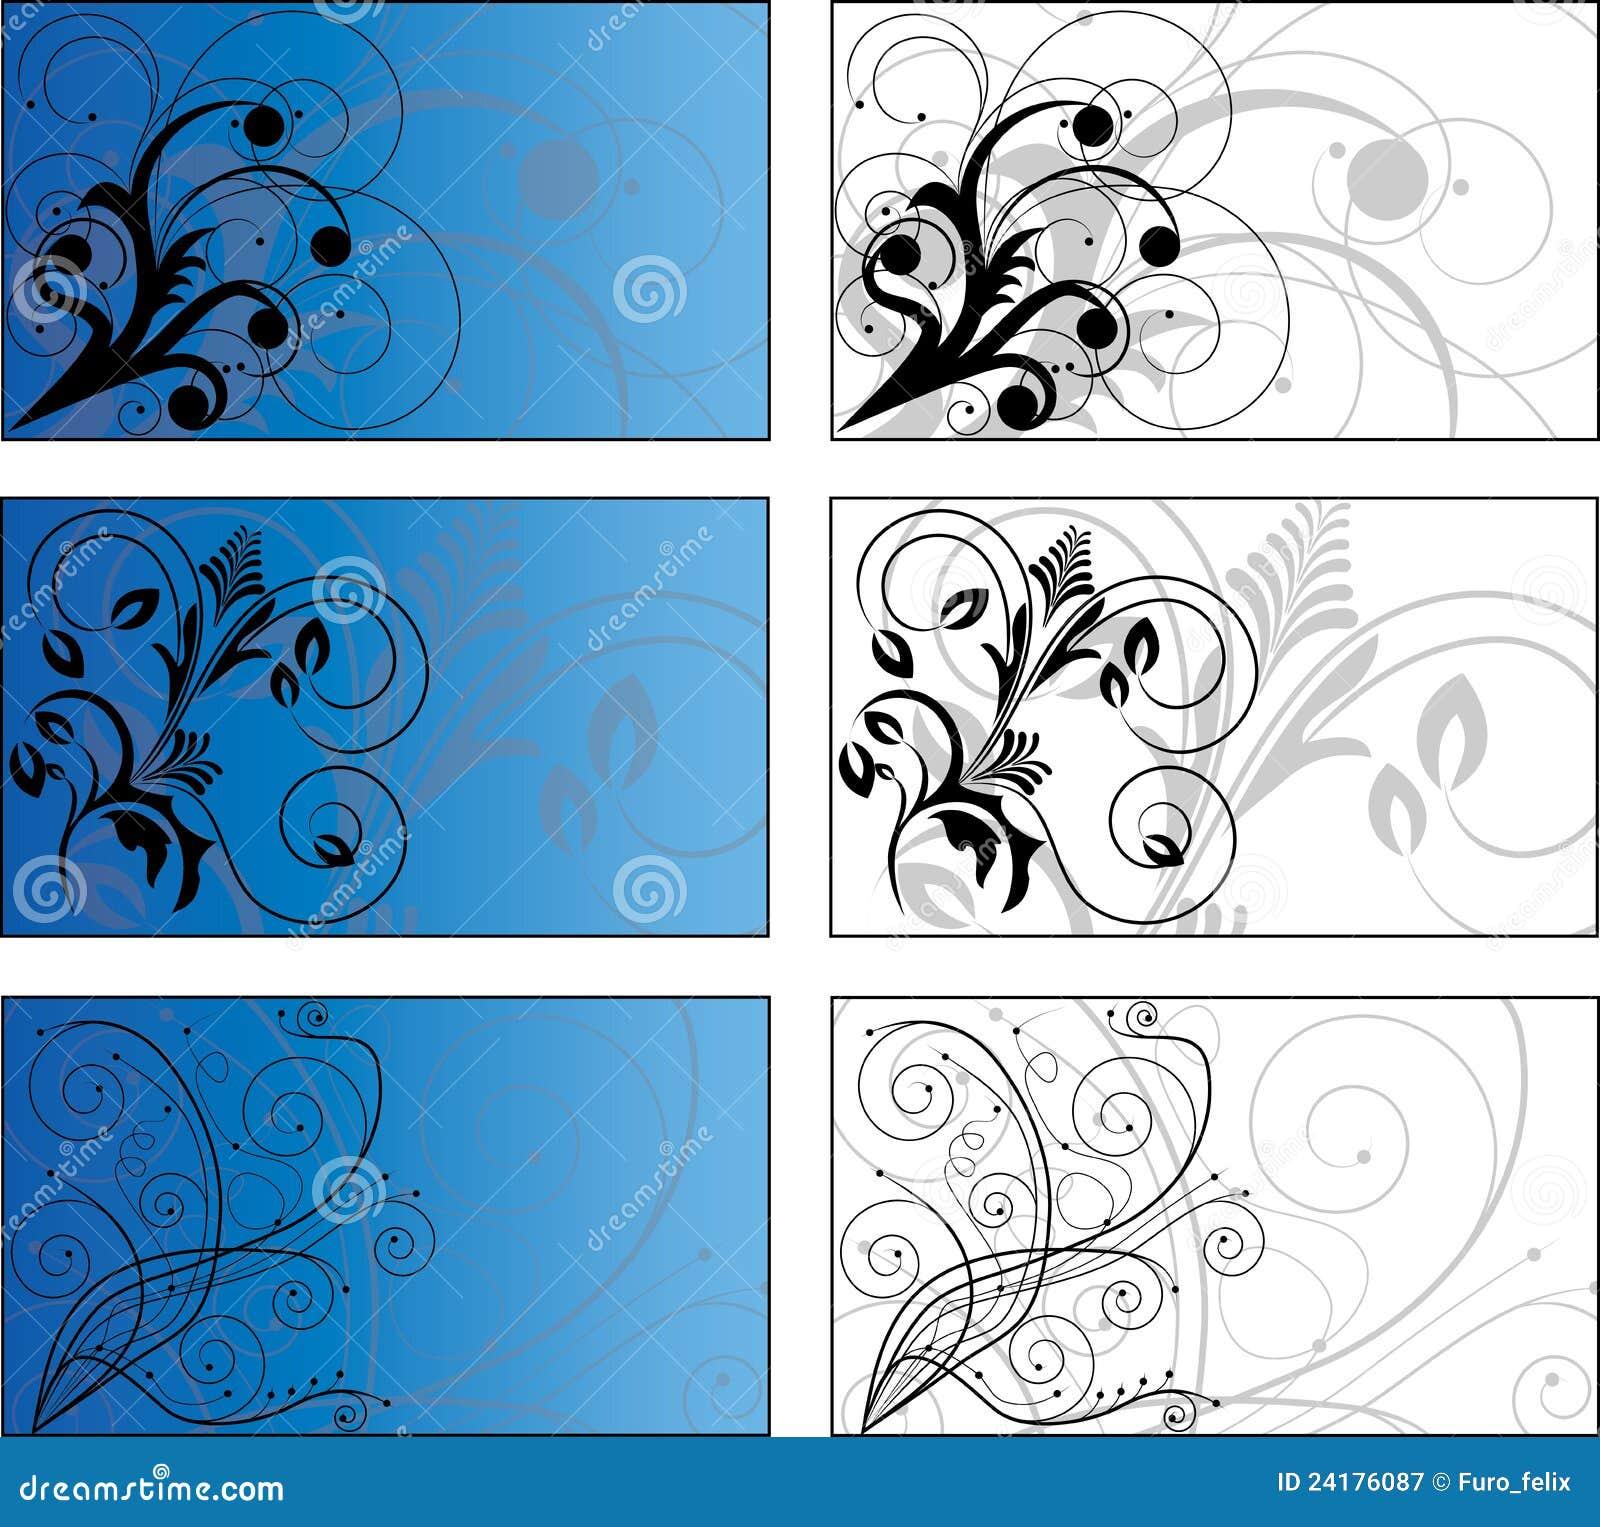 6 background designs stock vector illustration of for Design online